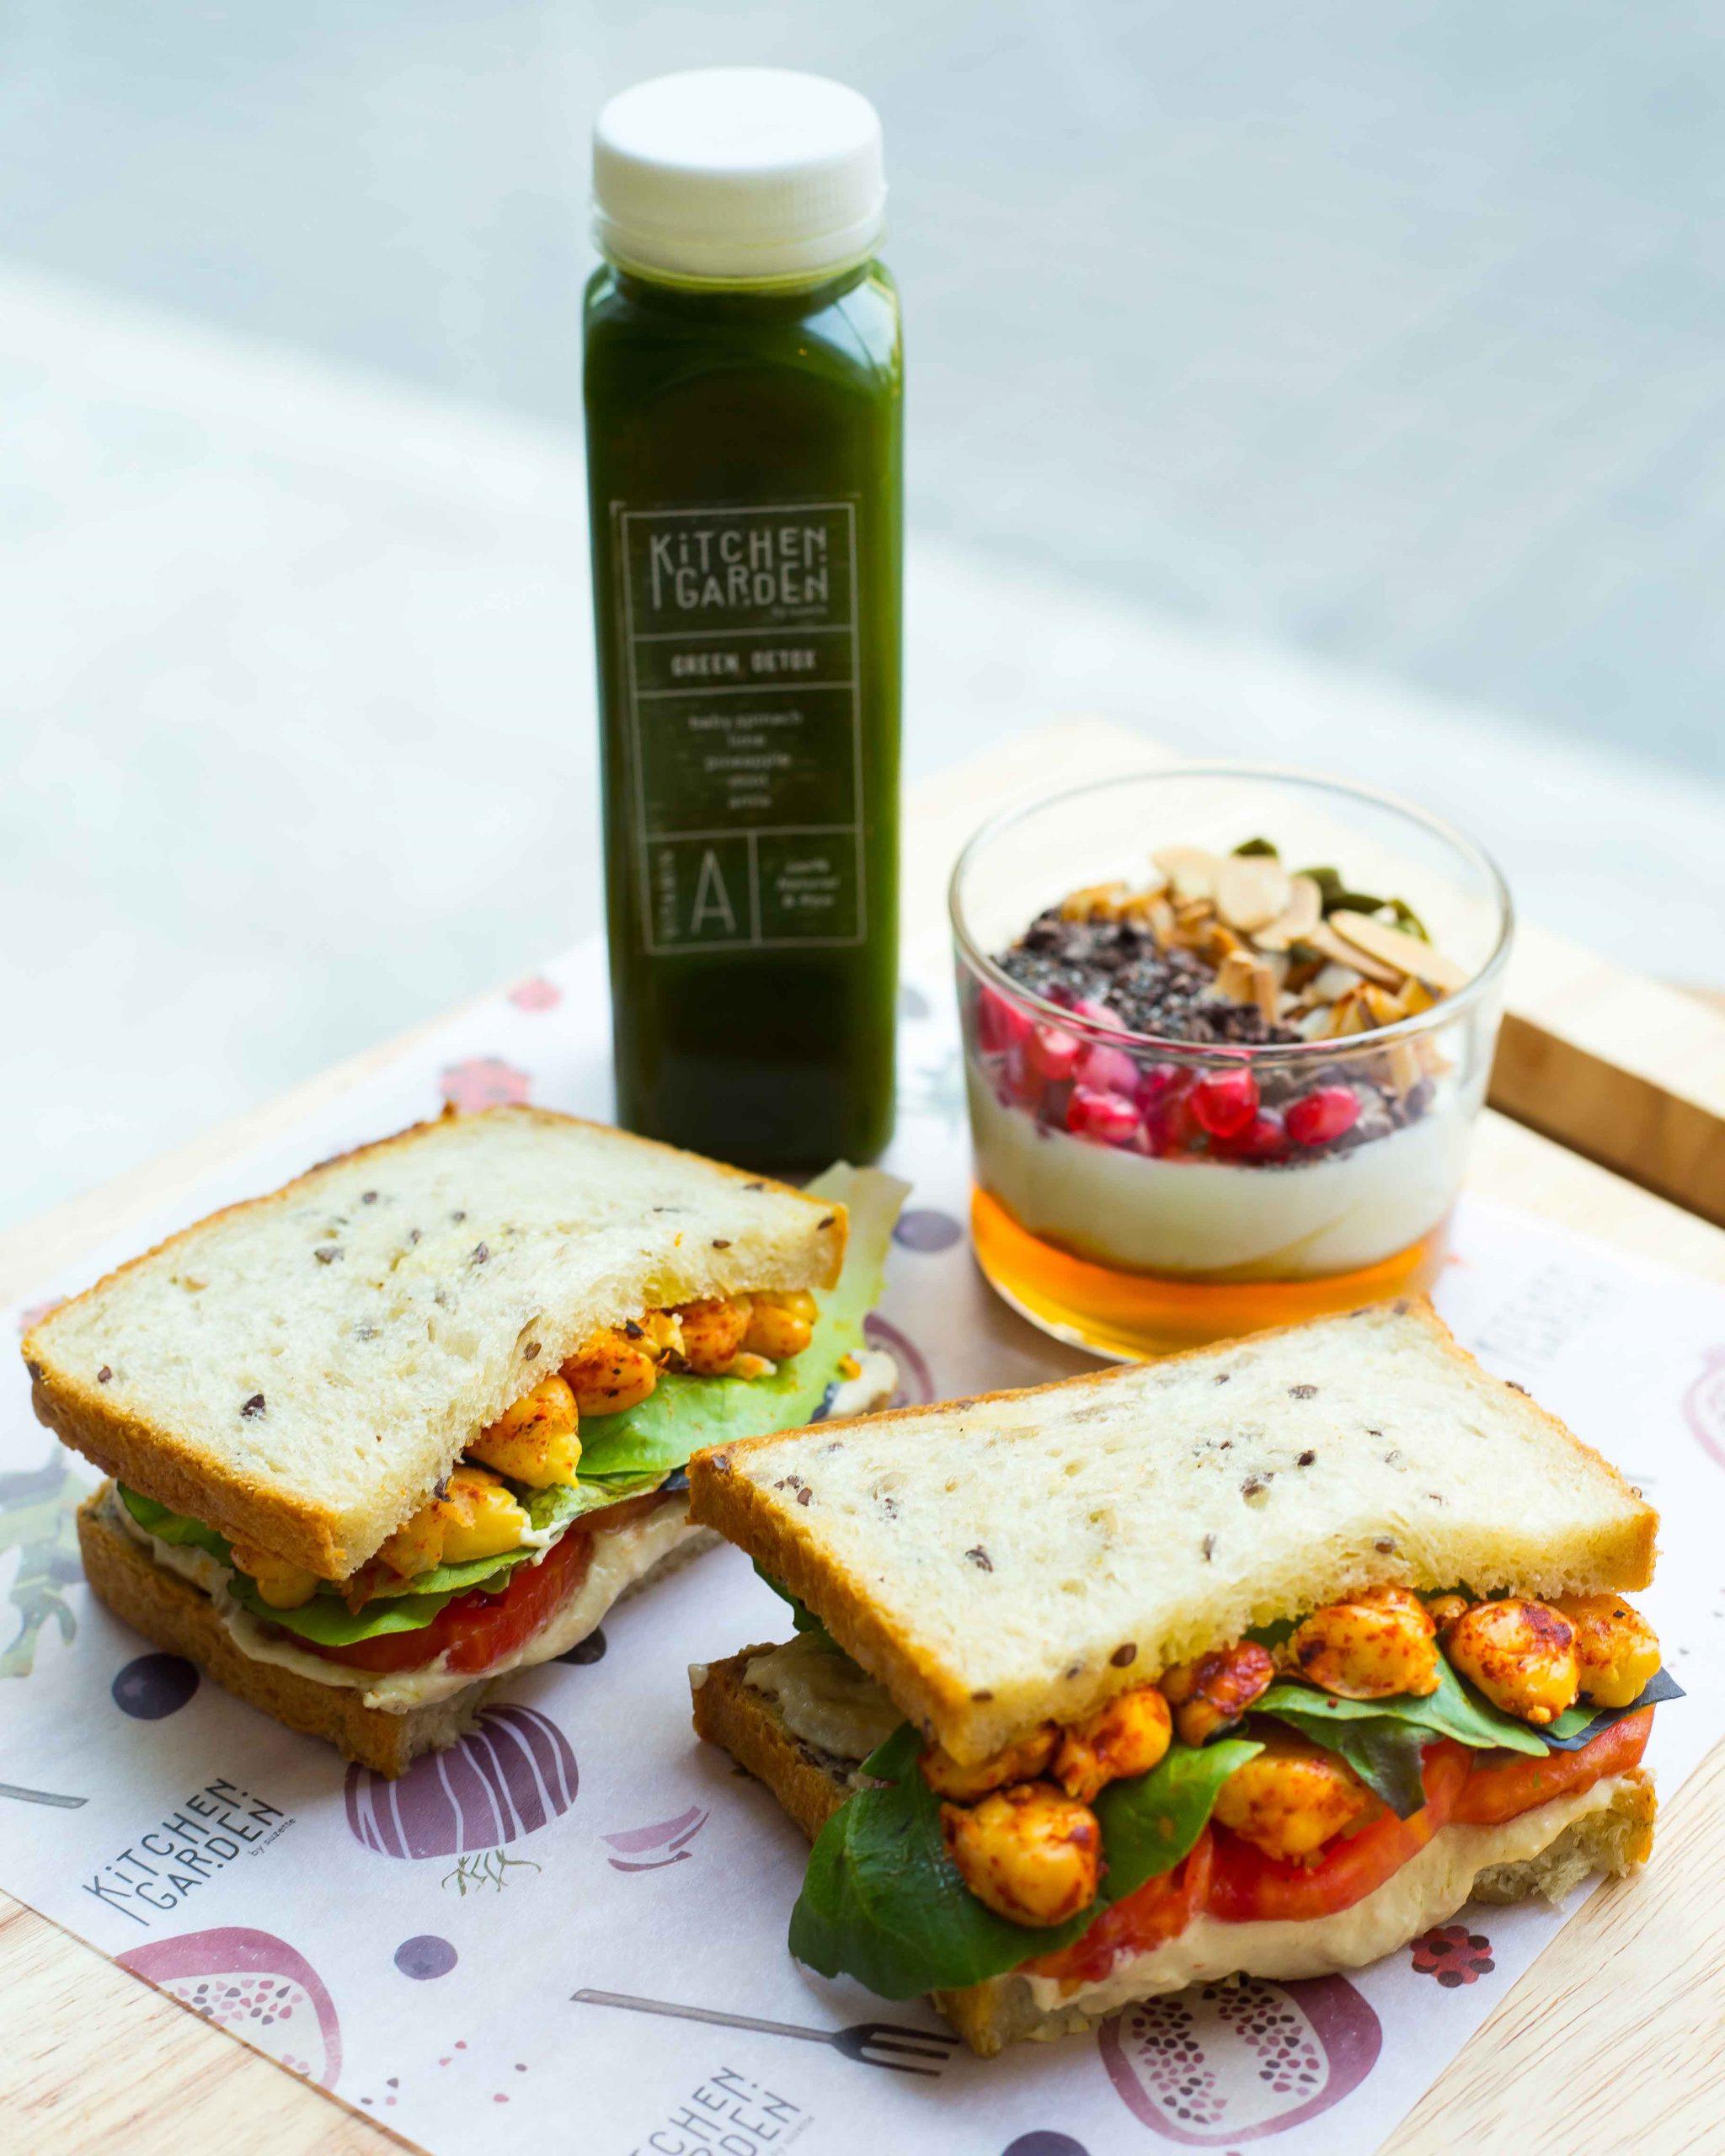 Hummus Multigrain Sandwich with green detox juice. Courtesy: Suzette